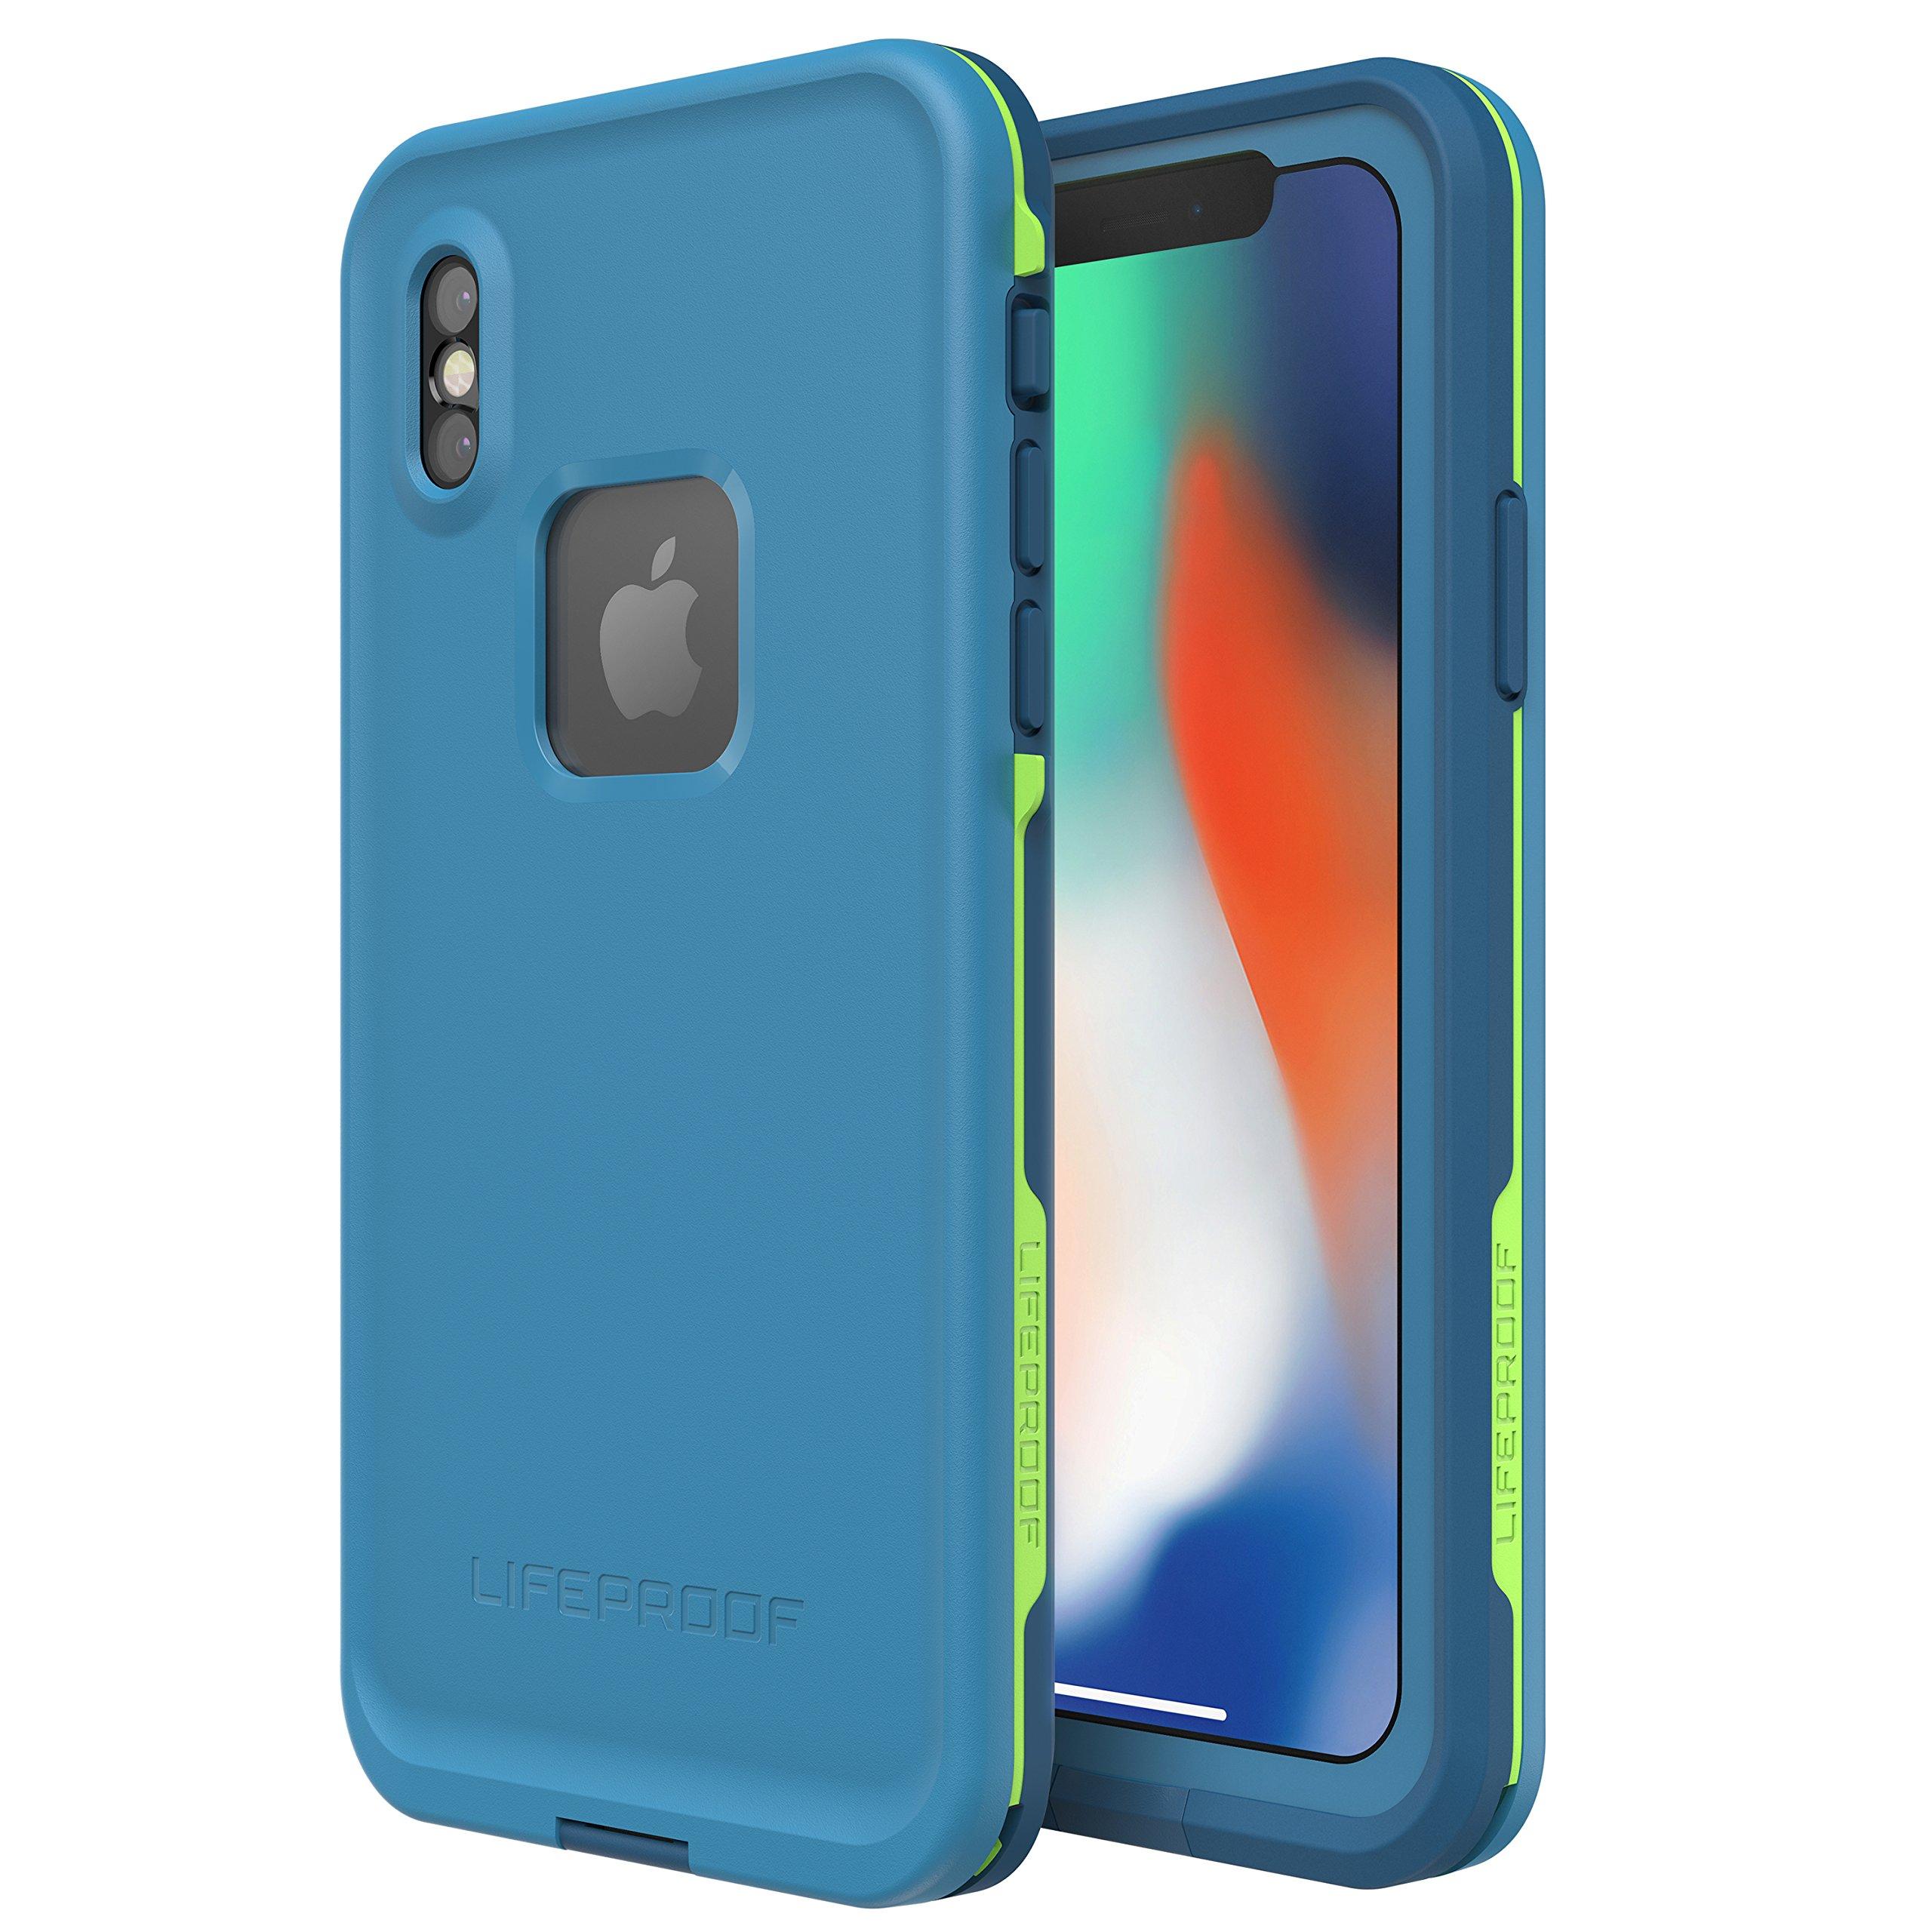 Lifeproof FRĒ SERIES Waterproof Case for iPhone X (ONLY) - Retail Packaging - BANZAI (COWABUNGA/WAVE CRASH/LONGBOARD) by LifeProof